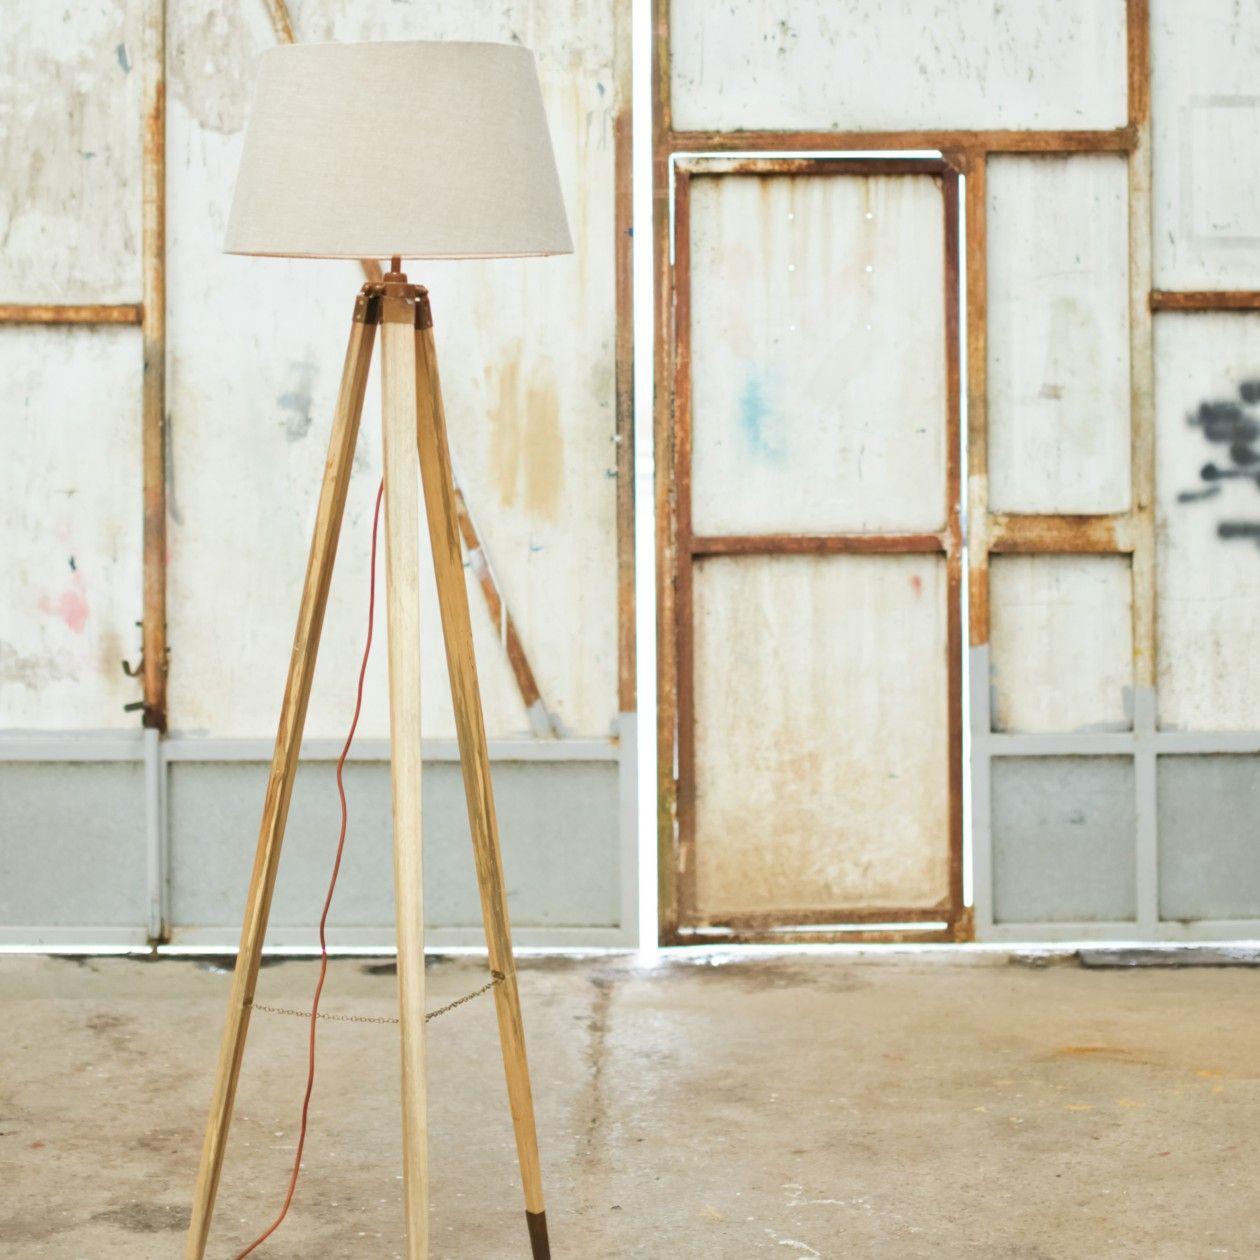 OBASI TRIPOD LAMP 170 x 50cm (dia)